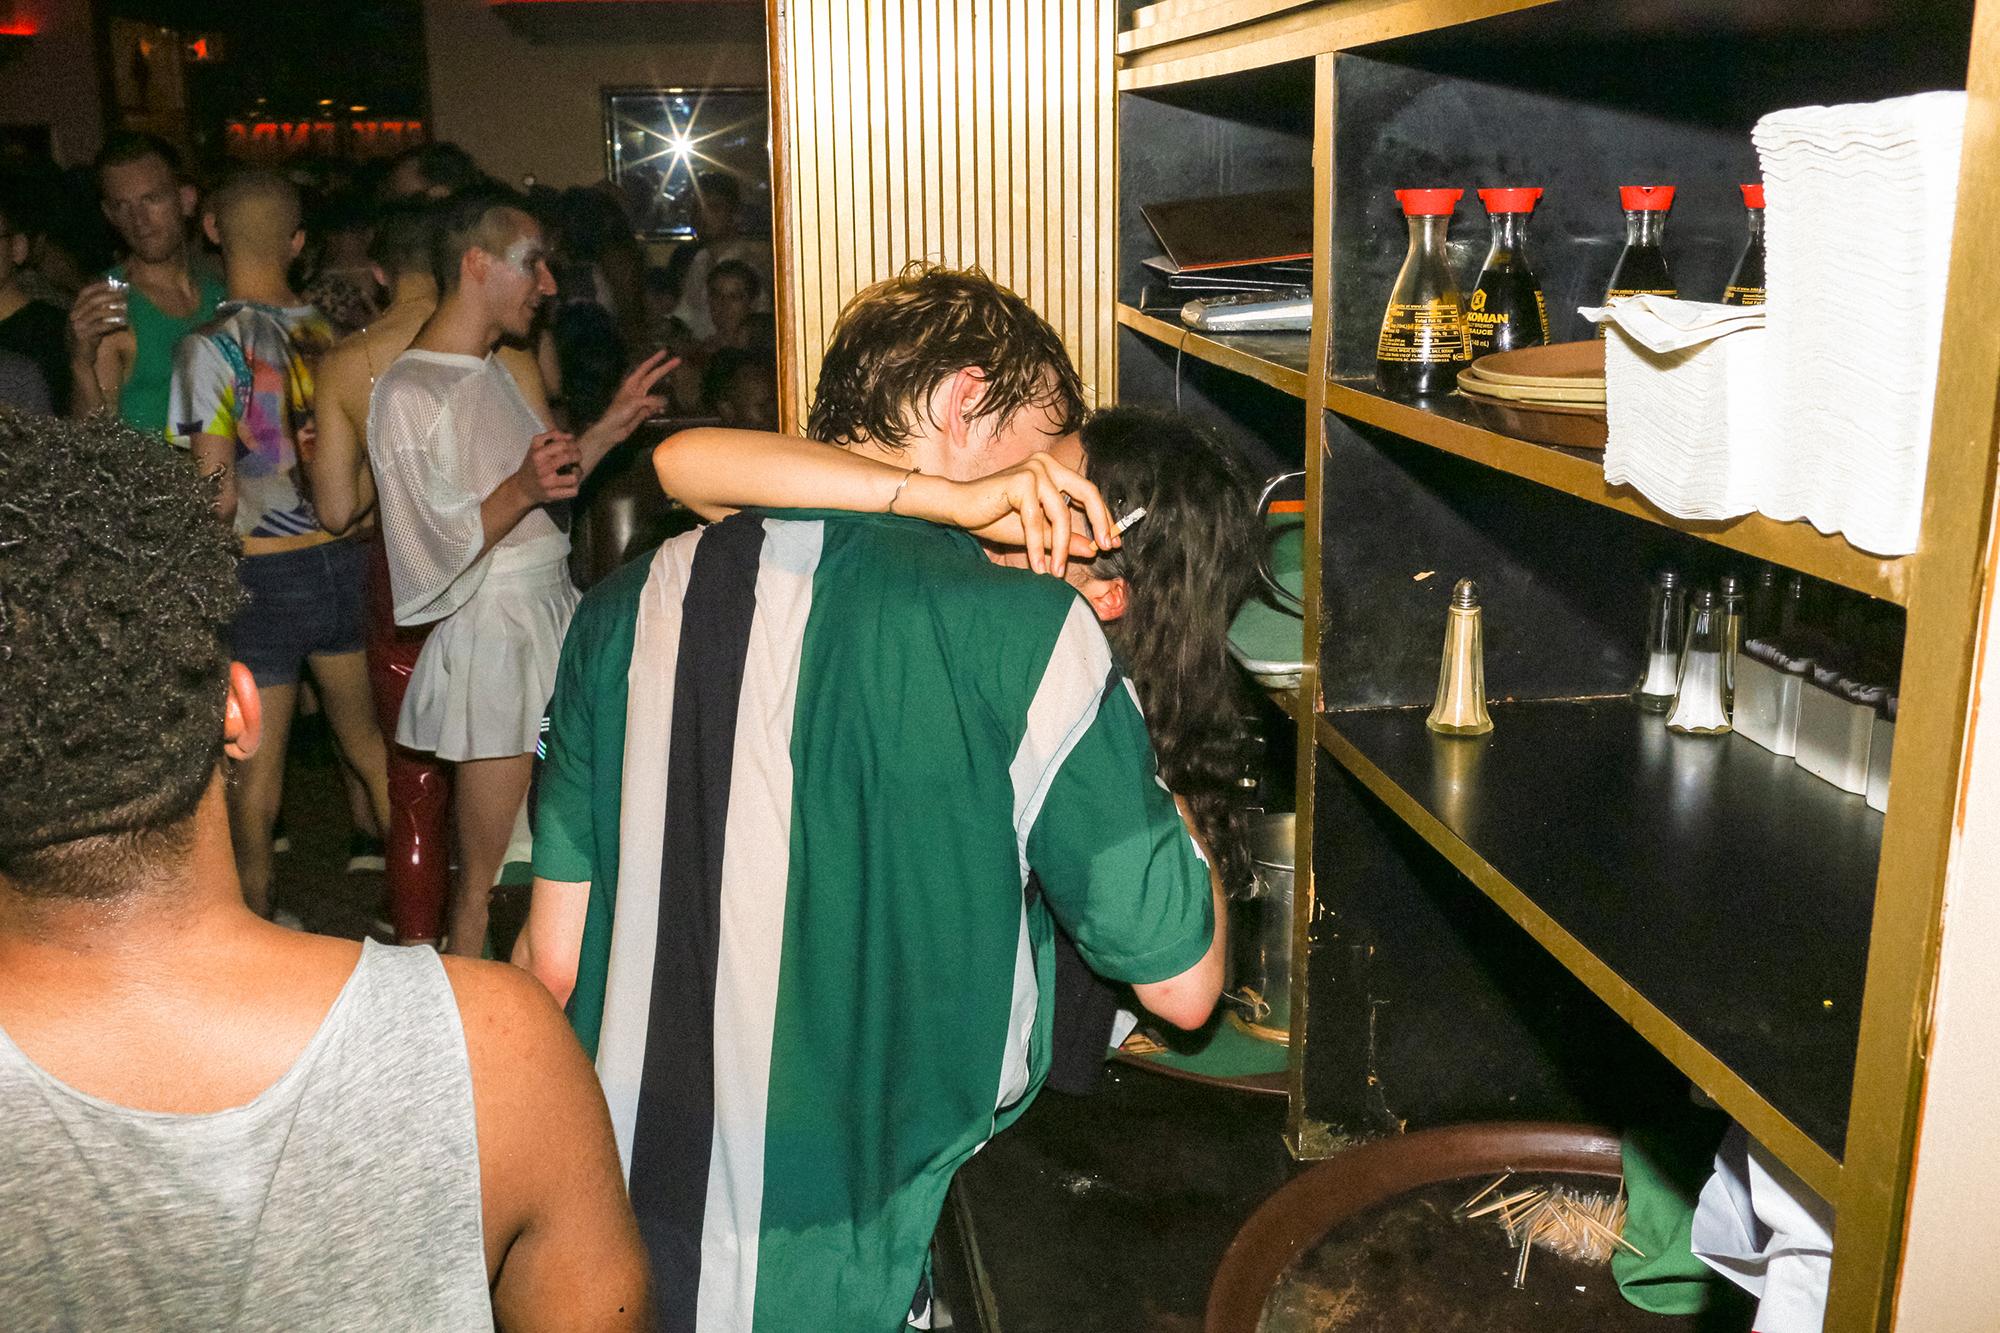 Serichai_ChinaChalet-kiss.jpg